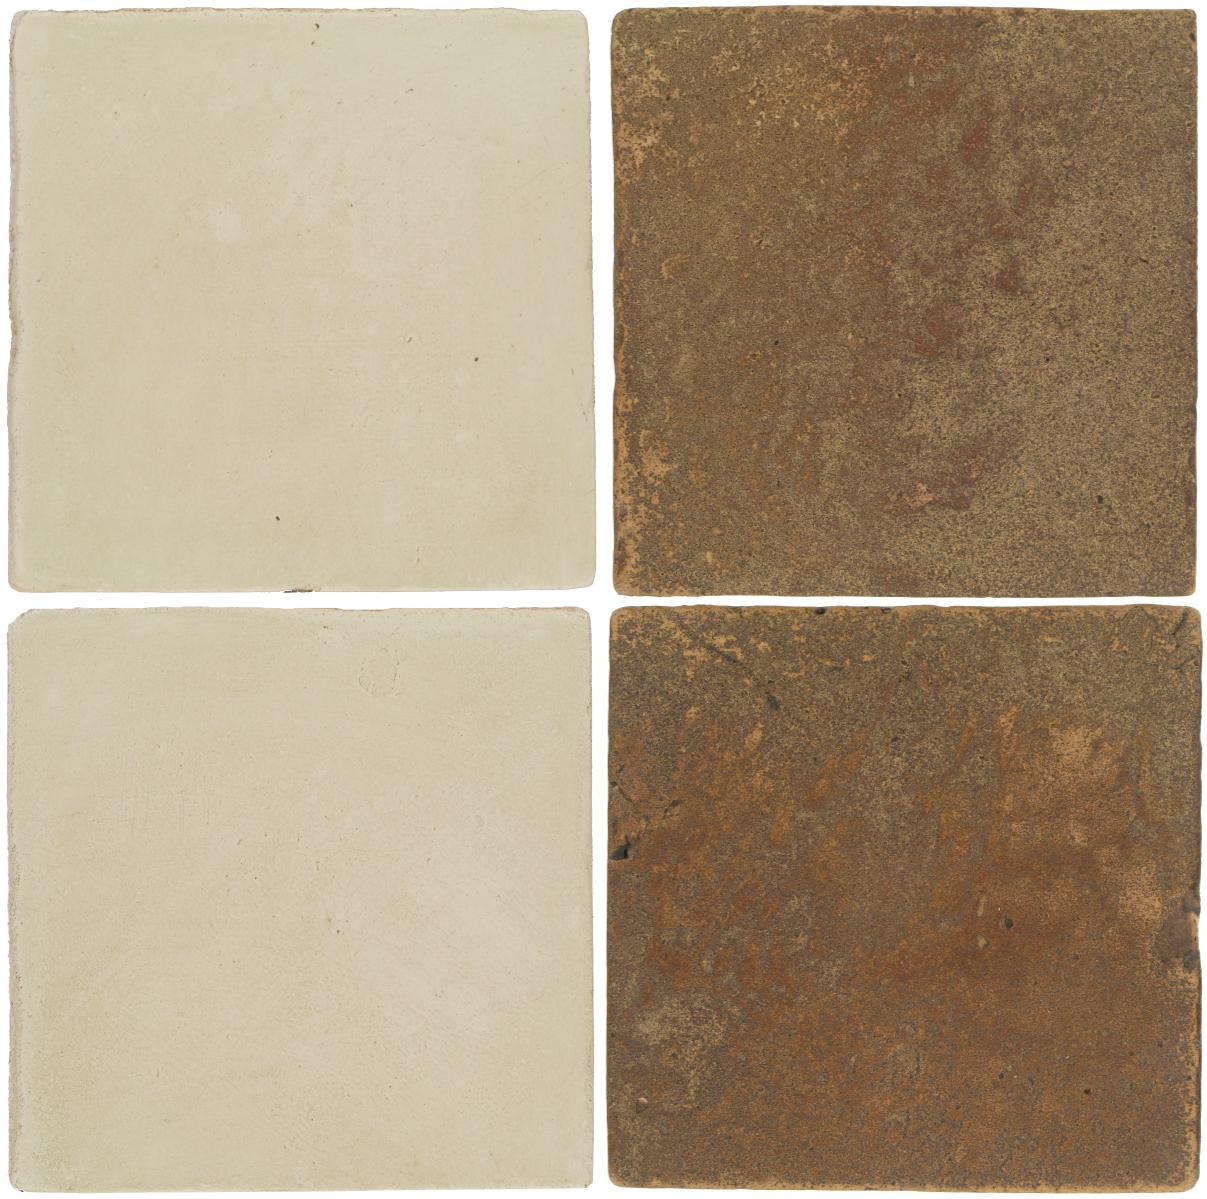 Pedralbes Antique Terracotta  2 Color Combinations  OHS-PGLW Glacier White + VTG-PSCM Camel Brown